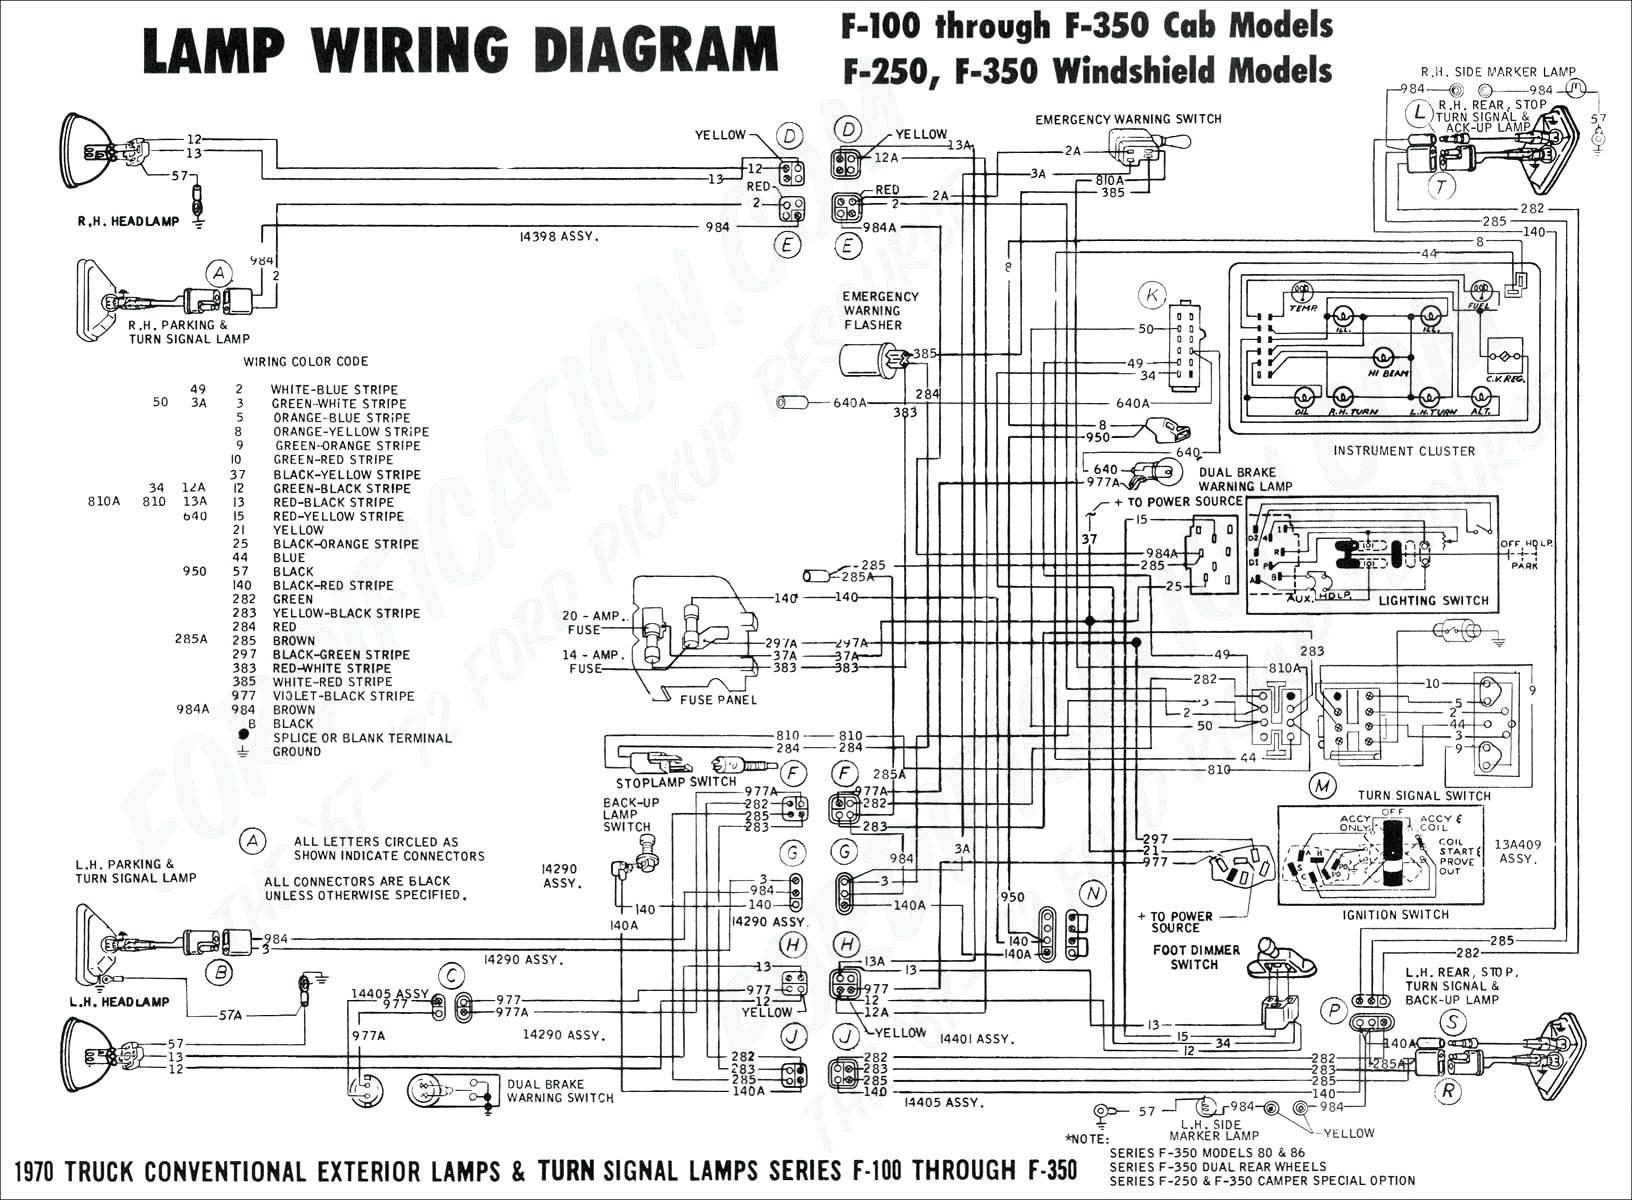 2004 Trailblazer Engine Diagram 2004 Trailblazer Fuse Box Wiring Diagram toolbox Of 2004 Trailblazer Engine Diagram